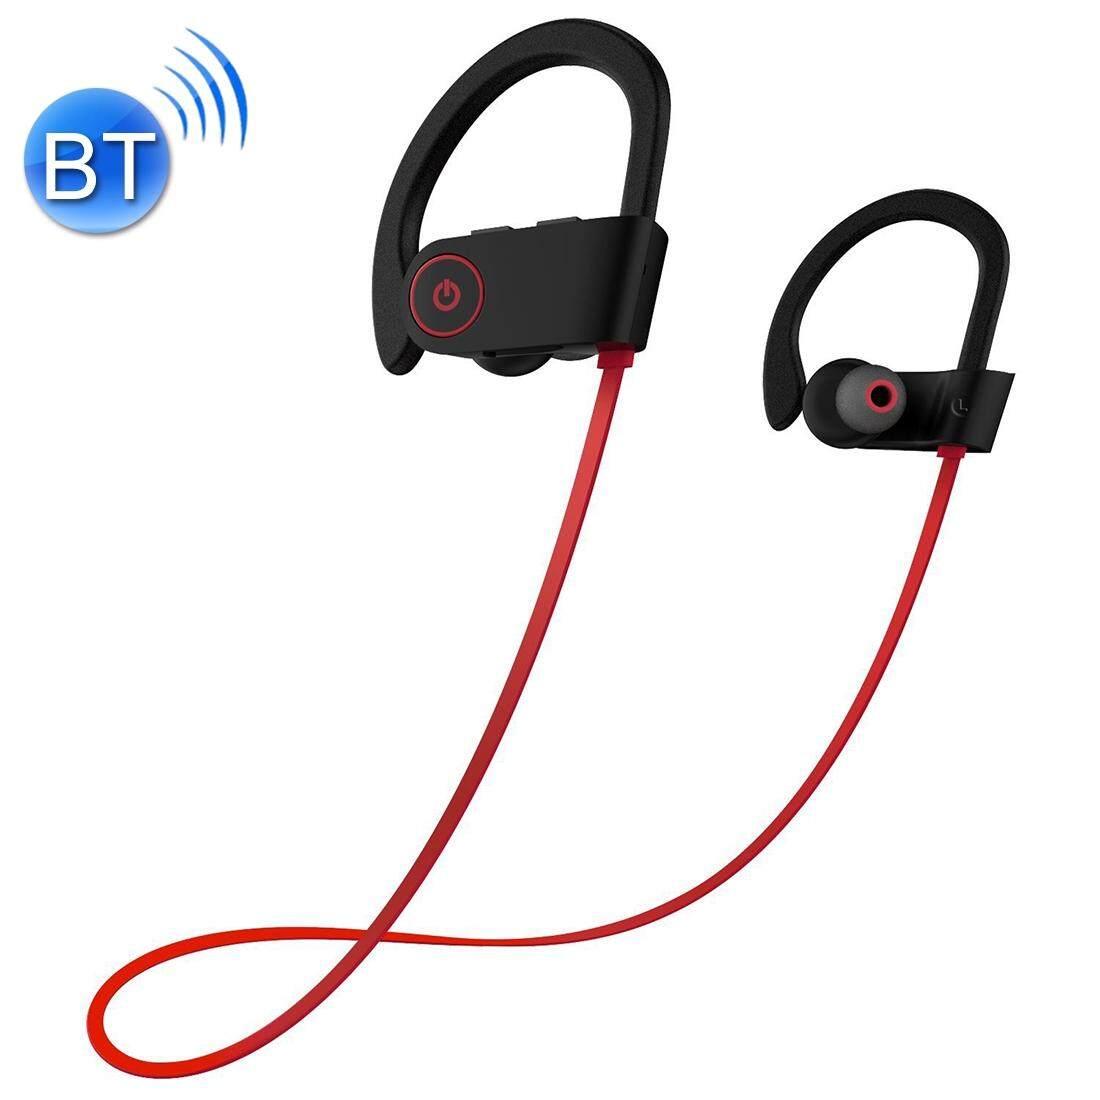 U8 กีฬาบลูทูธ 4.1 + EDR หูฟังสเตอริโอสวมหูชุดหูฟังสำหรับ iPhone, Samsung, Huawei, Xiaomi, HTC และโทรศัพท์สมาร์ทอื่นๆ (สีแดง)